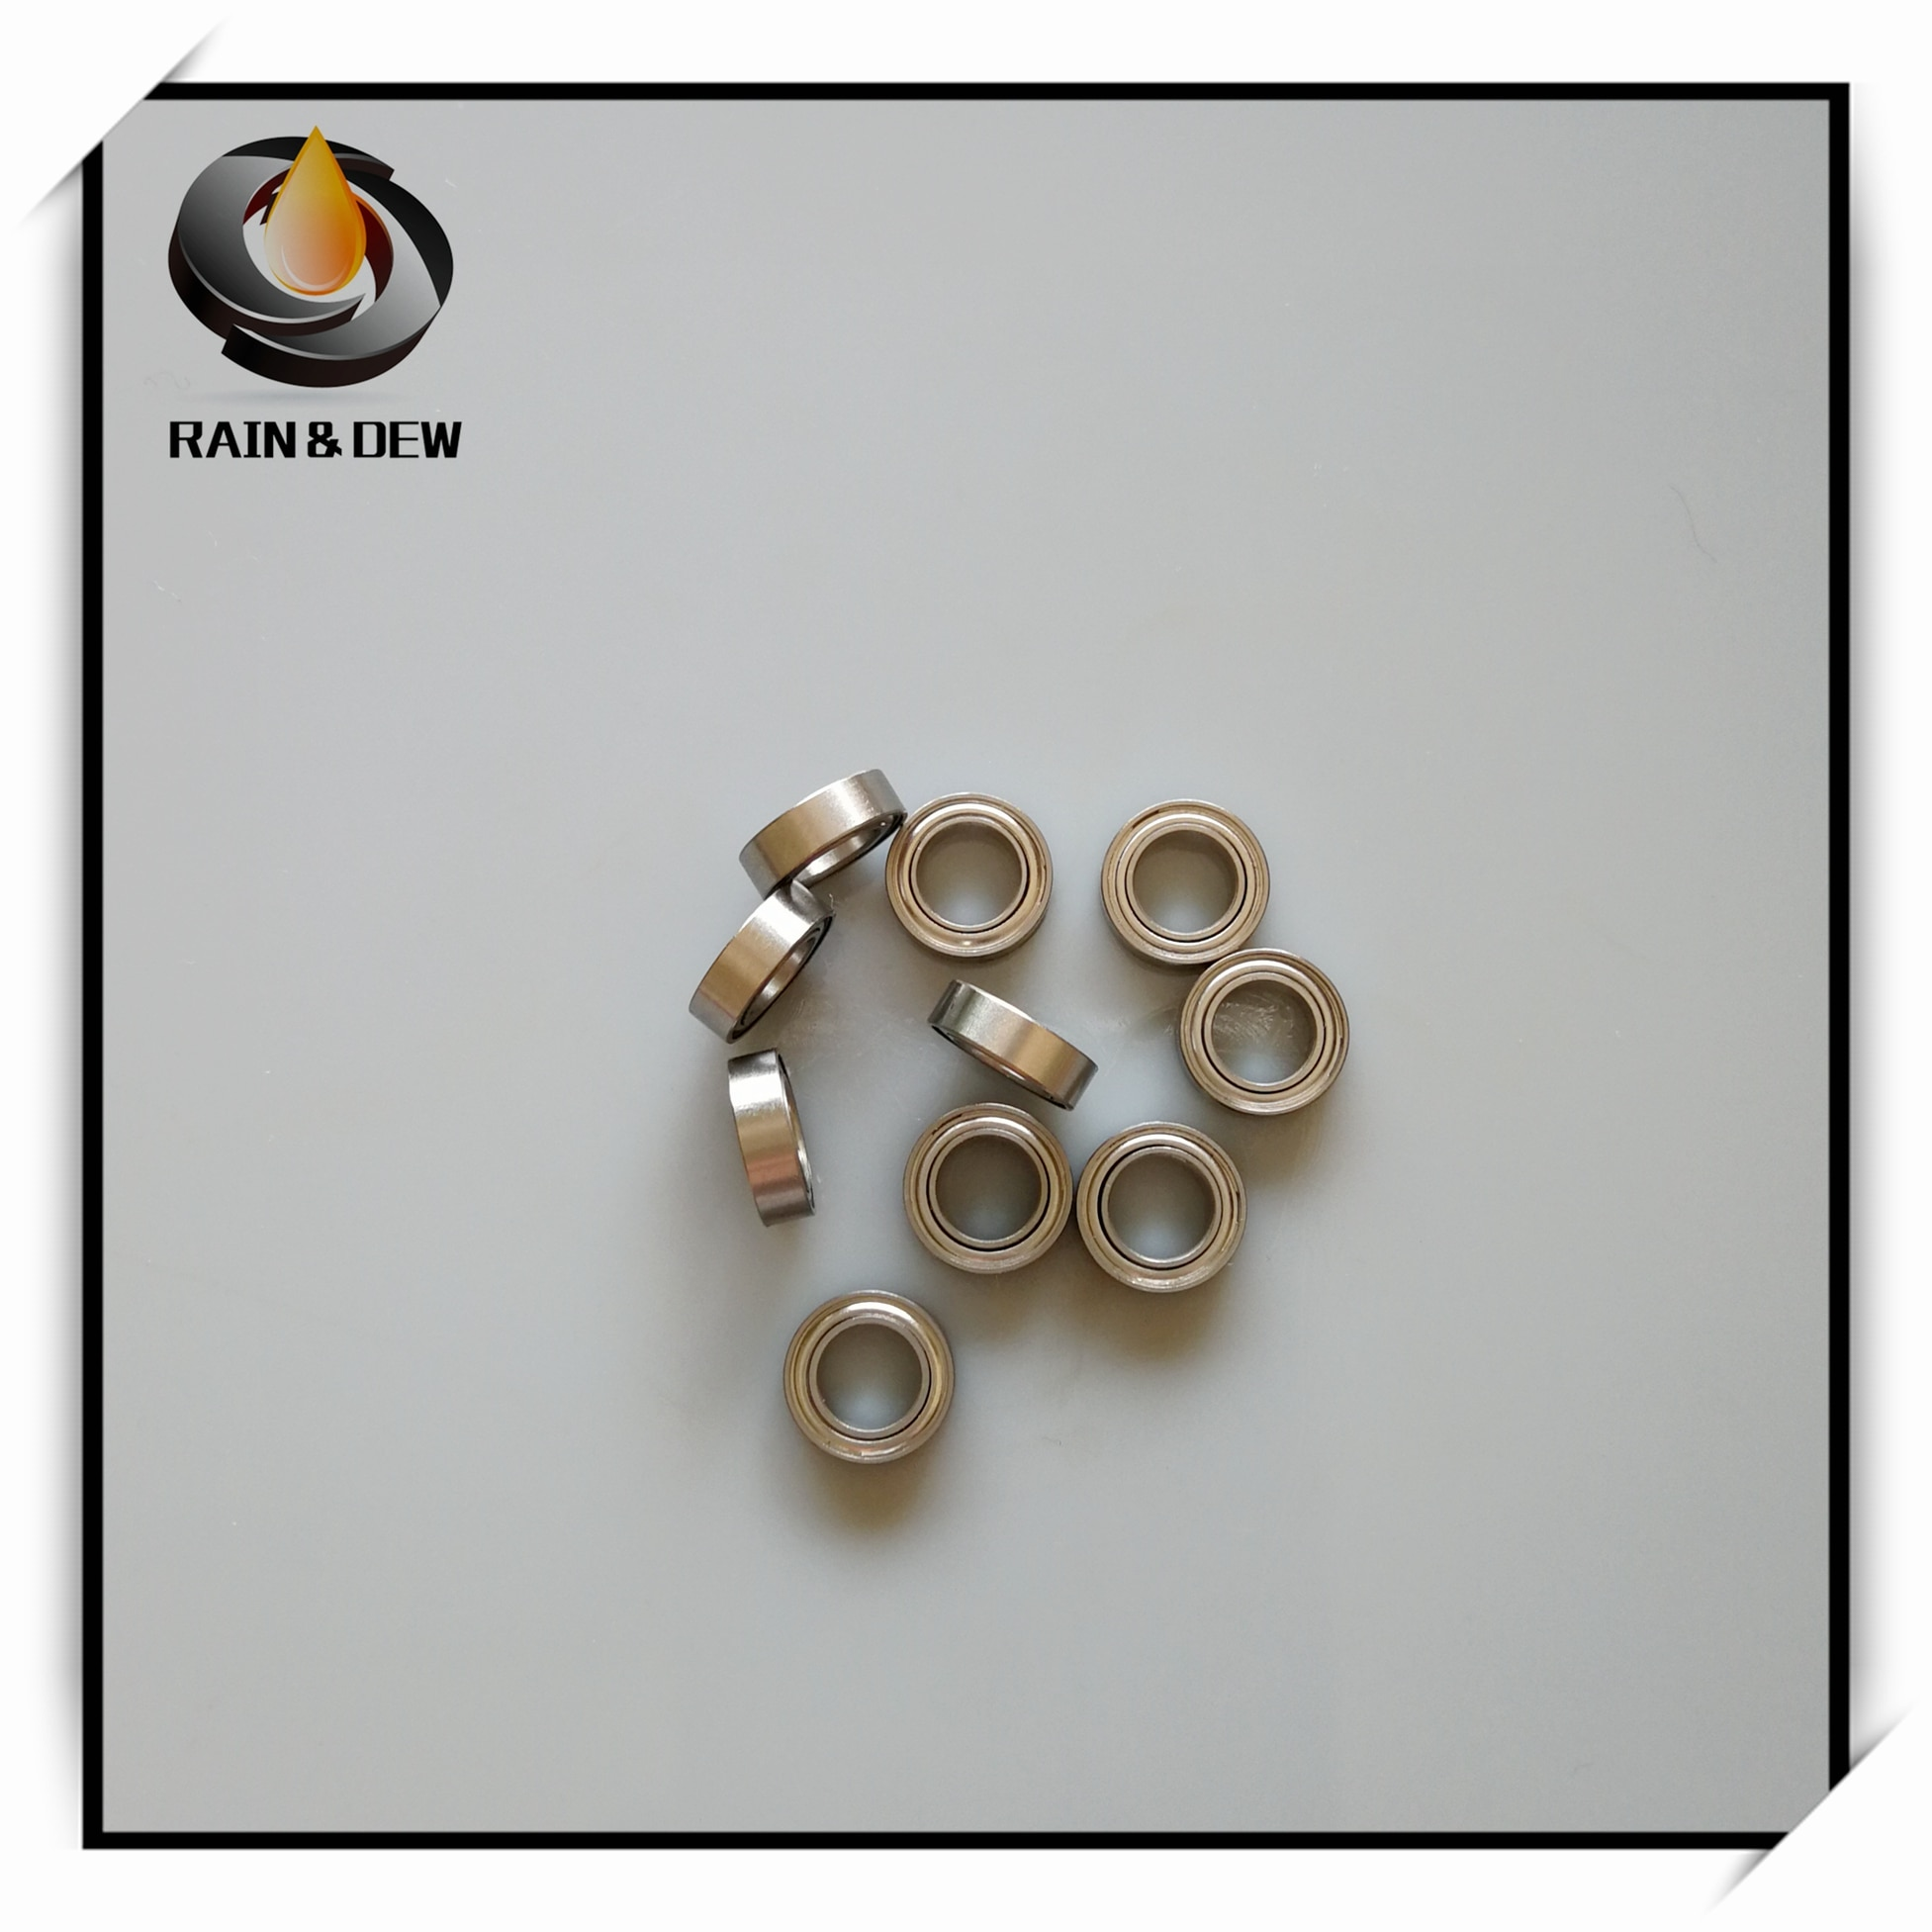 1Pcs  SMR95ZZ CB ABEC7 5X9X3 mm MR95 Stainless steel hybrid ceramic ball bearing RC  Bearing Set